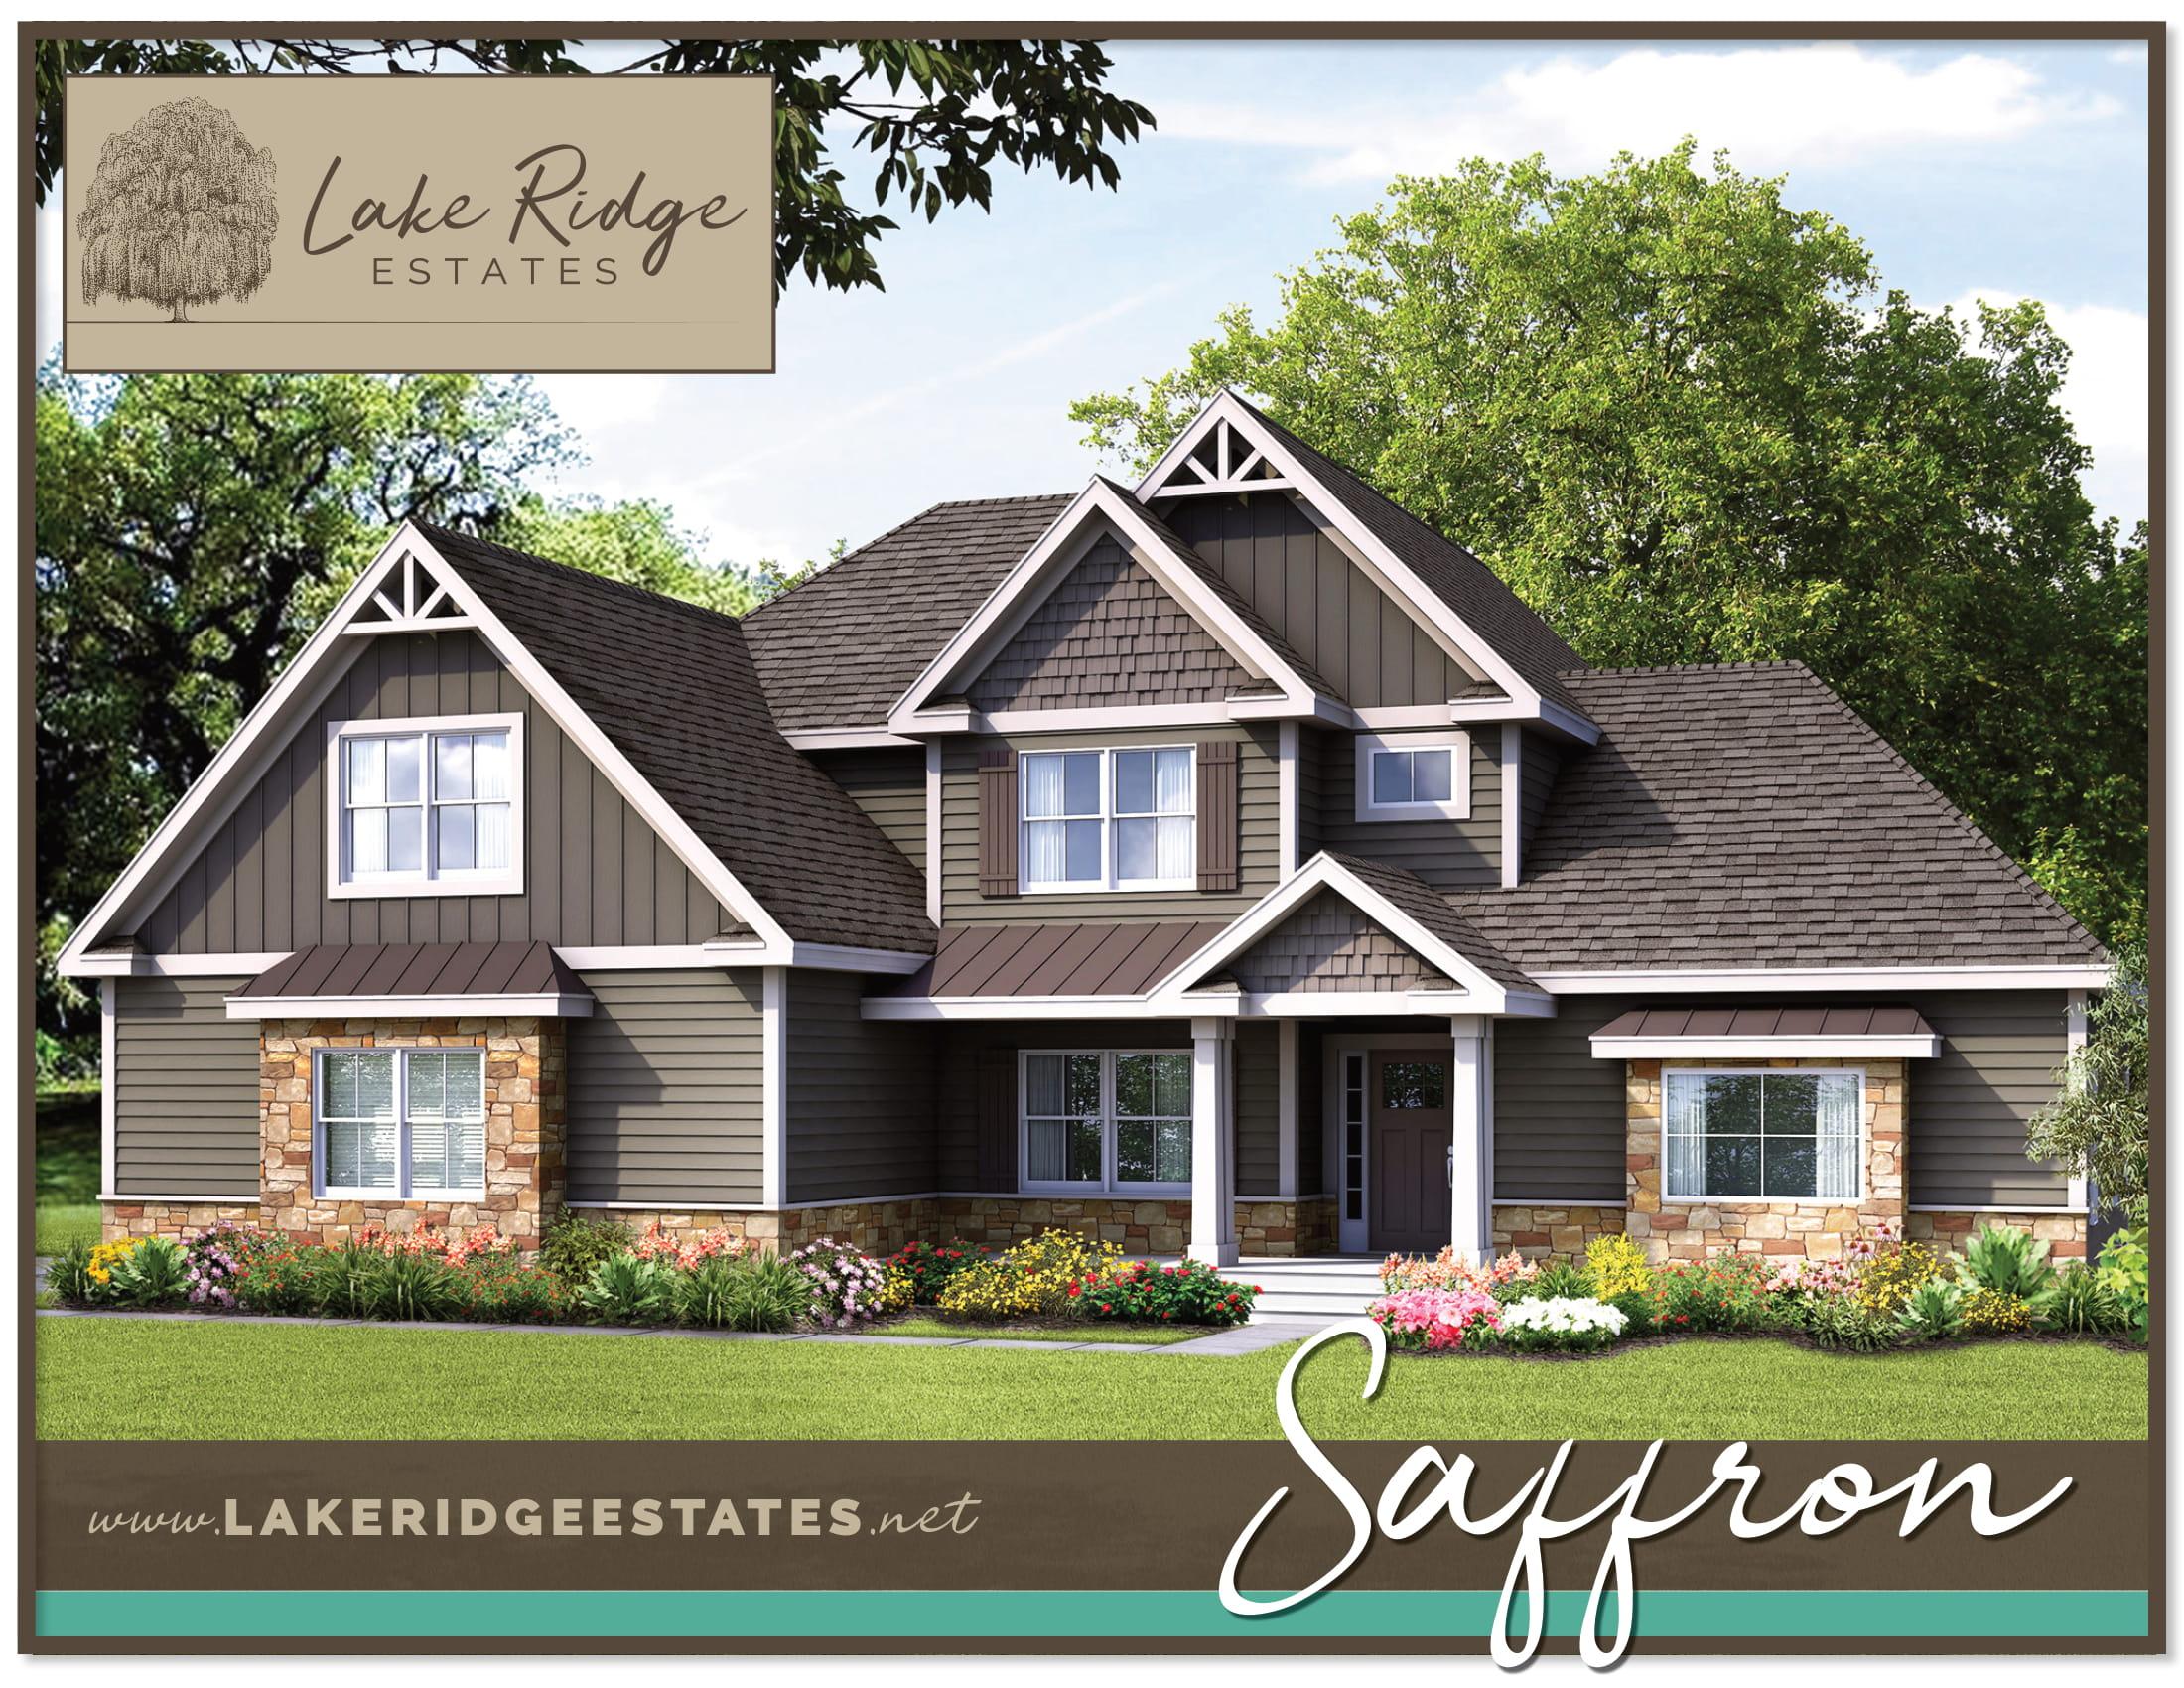 Christopher Ogden Middletown Ny Real Estate Thesaffron Lakeridge 1 1